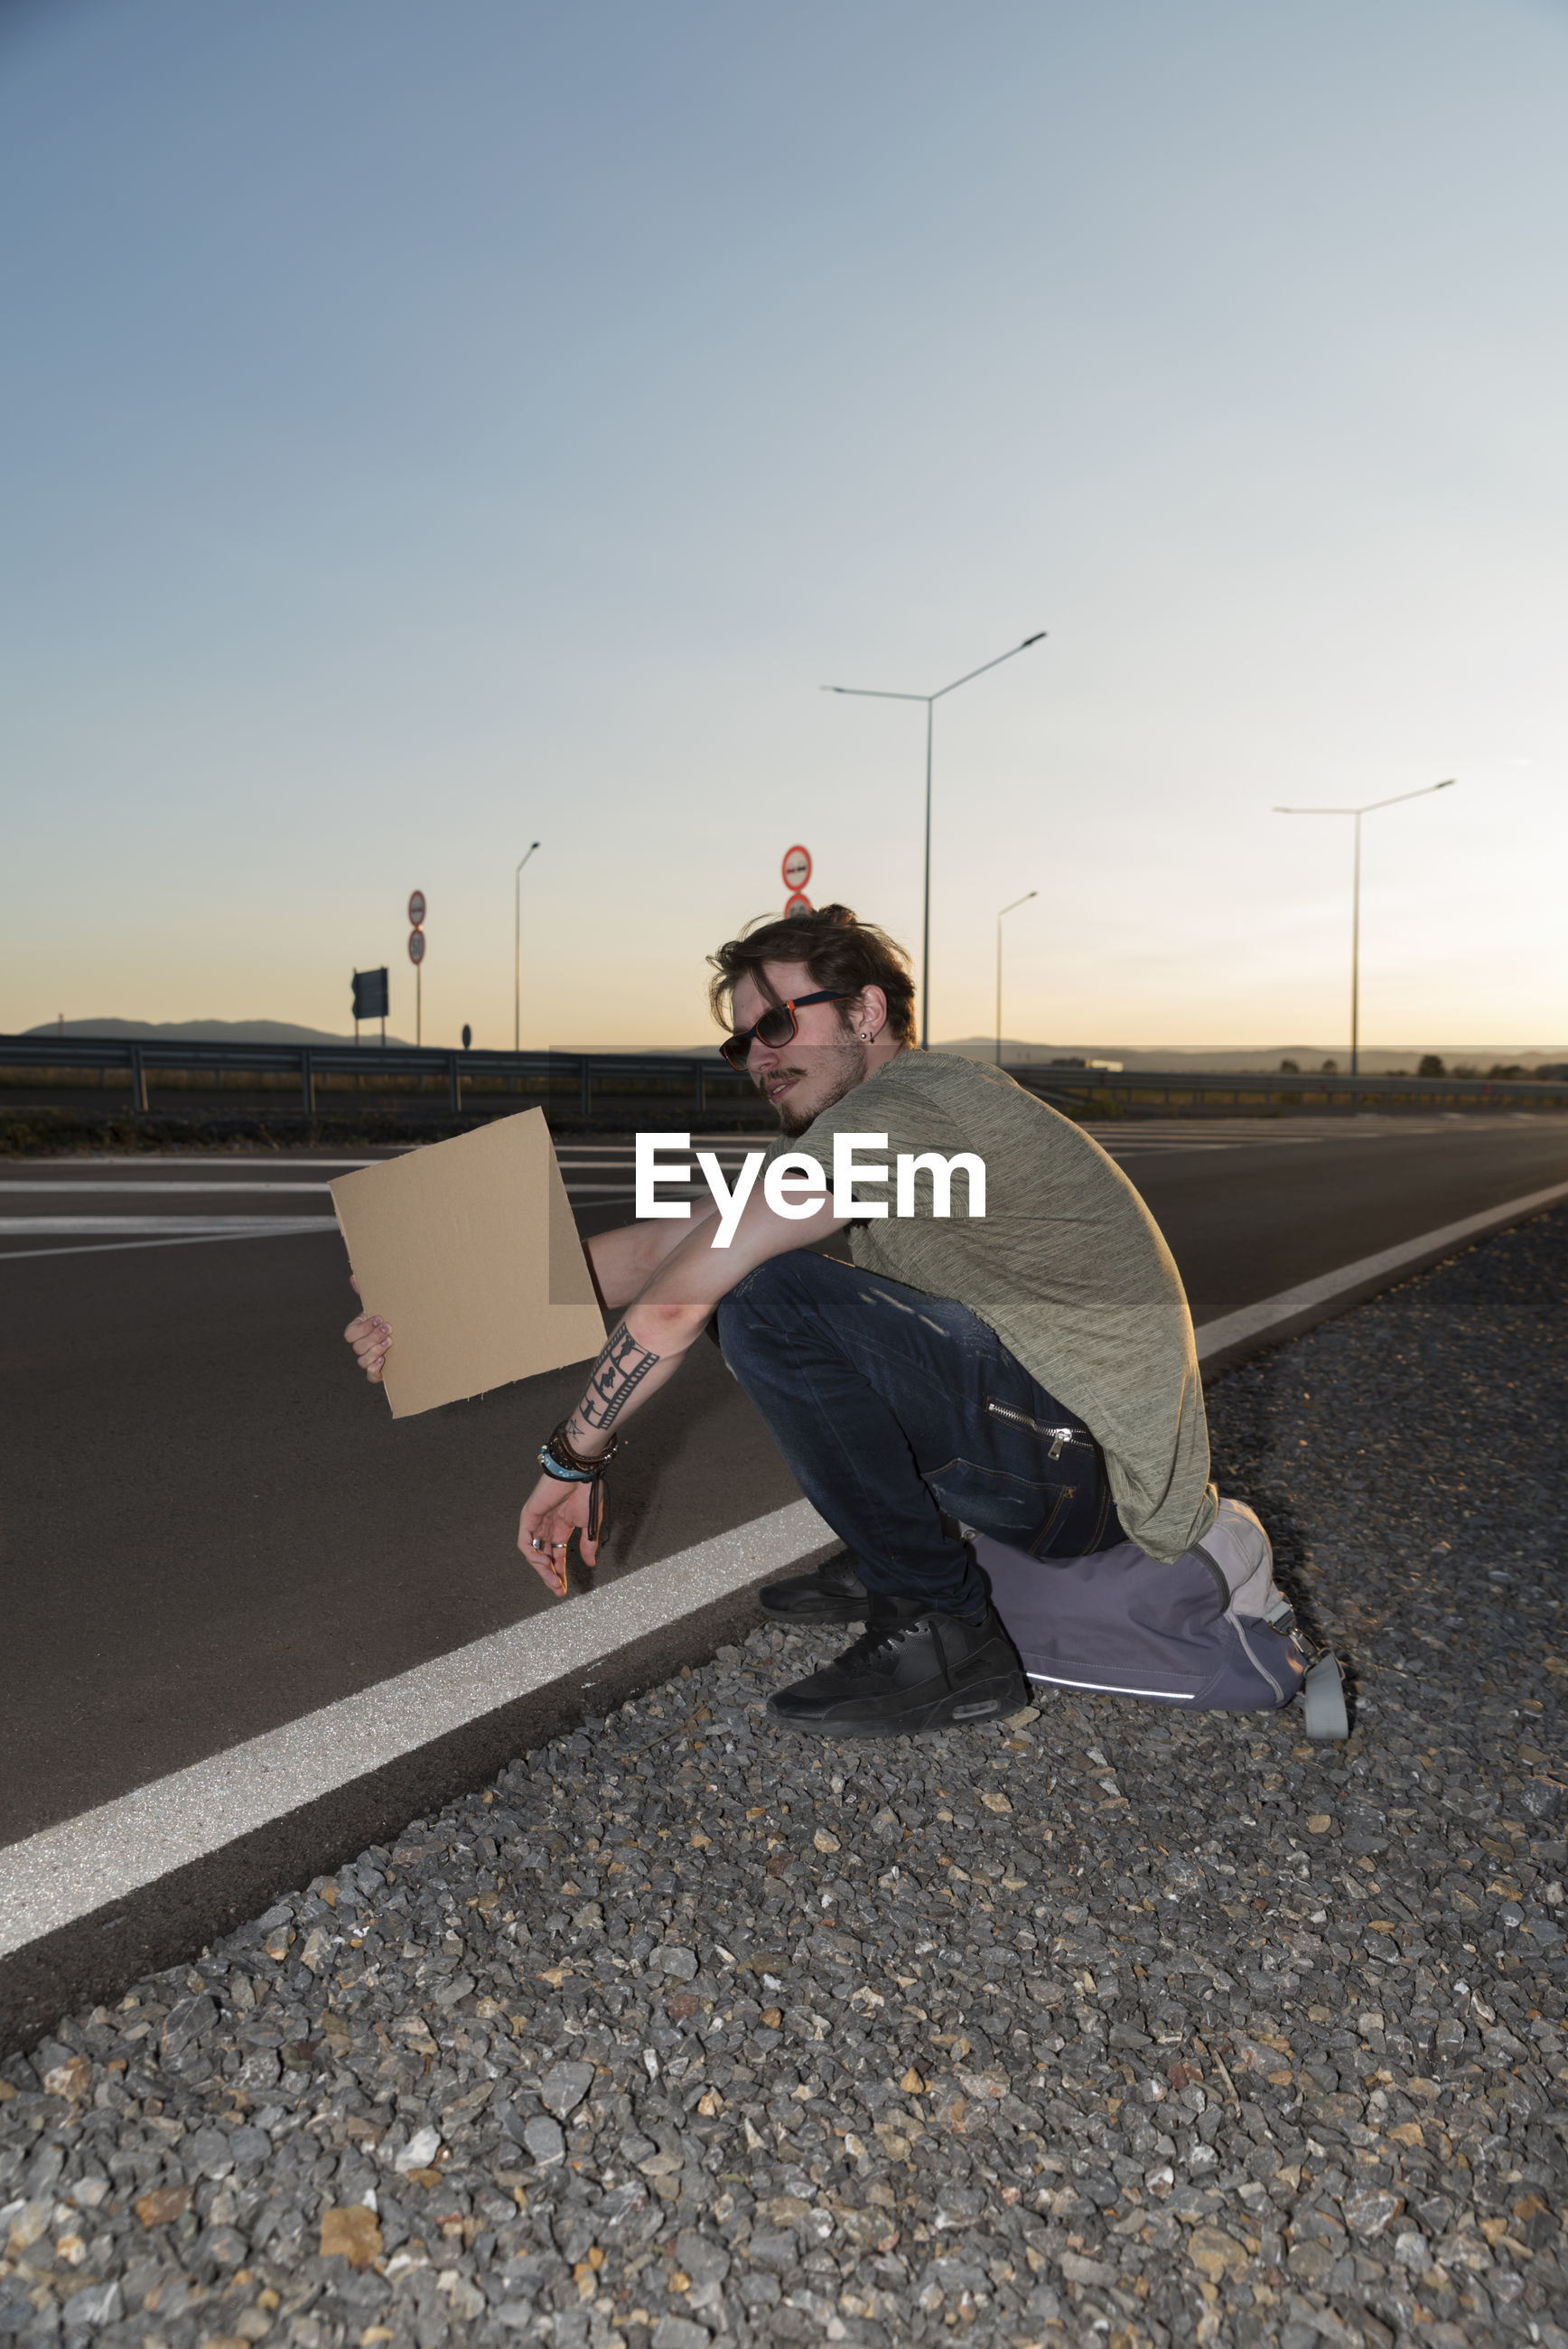 MAN SITTING ON ROAD WITH UMBRELLA